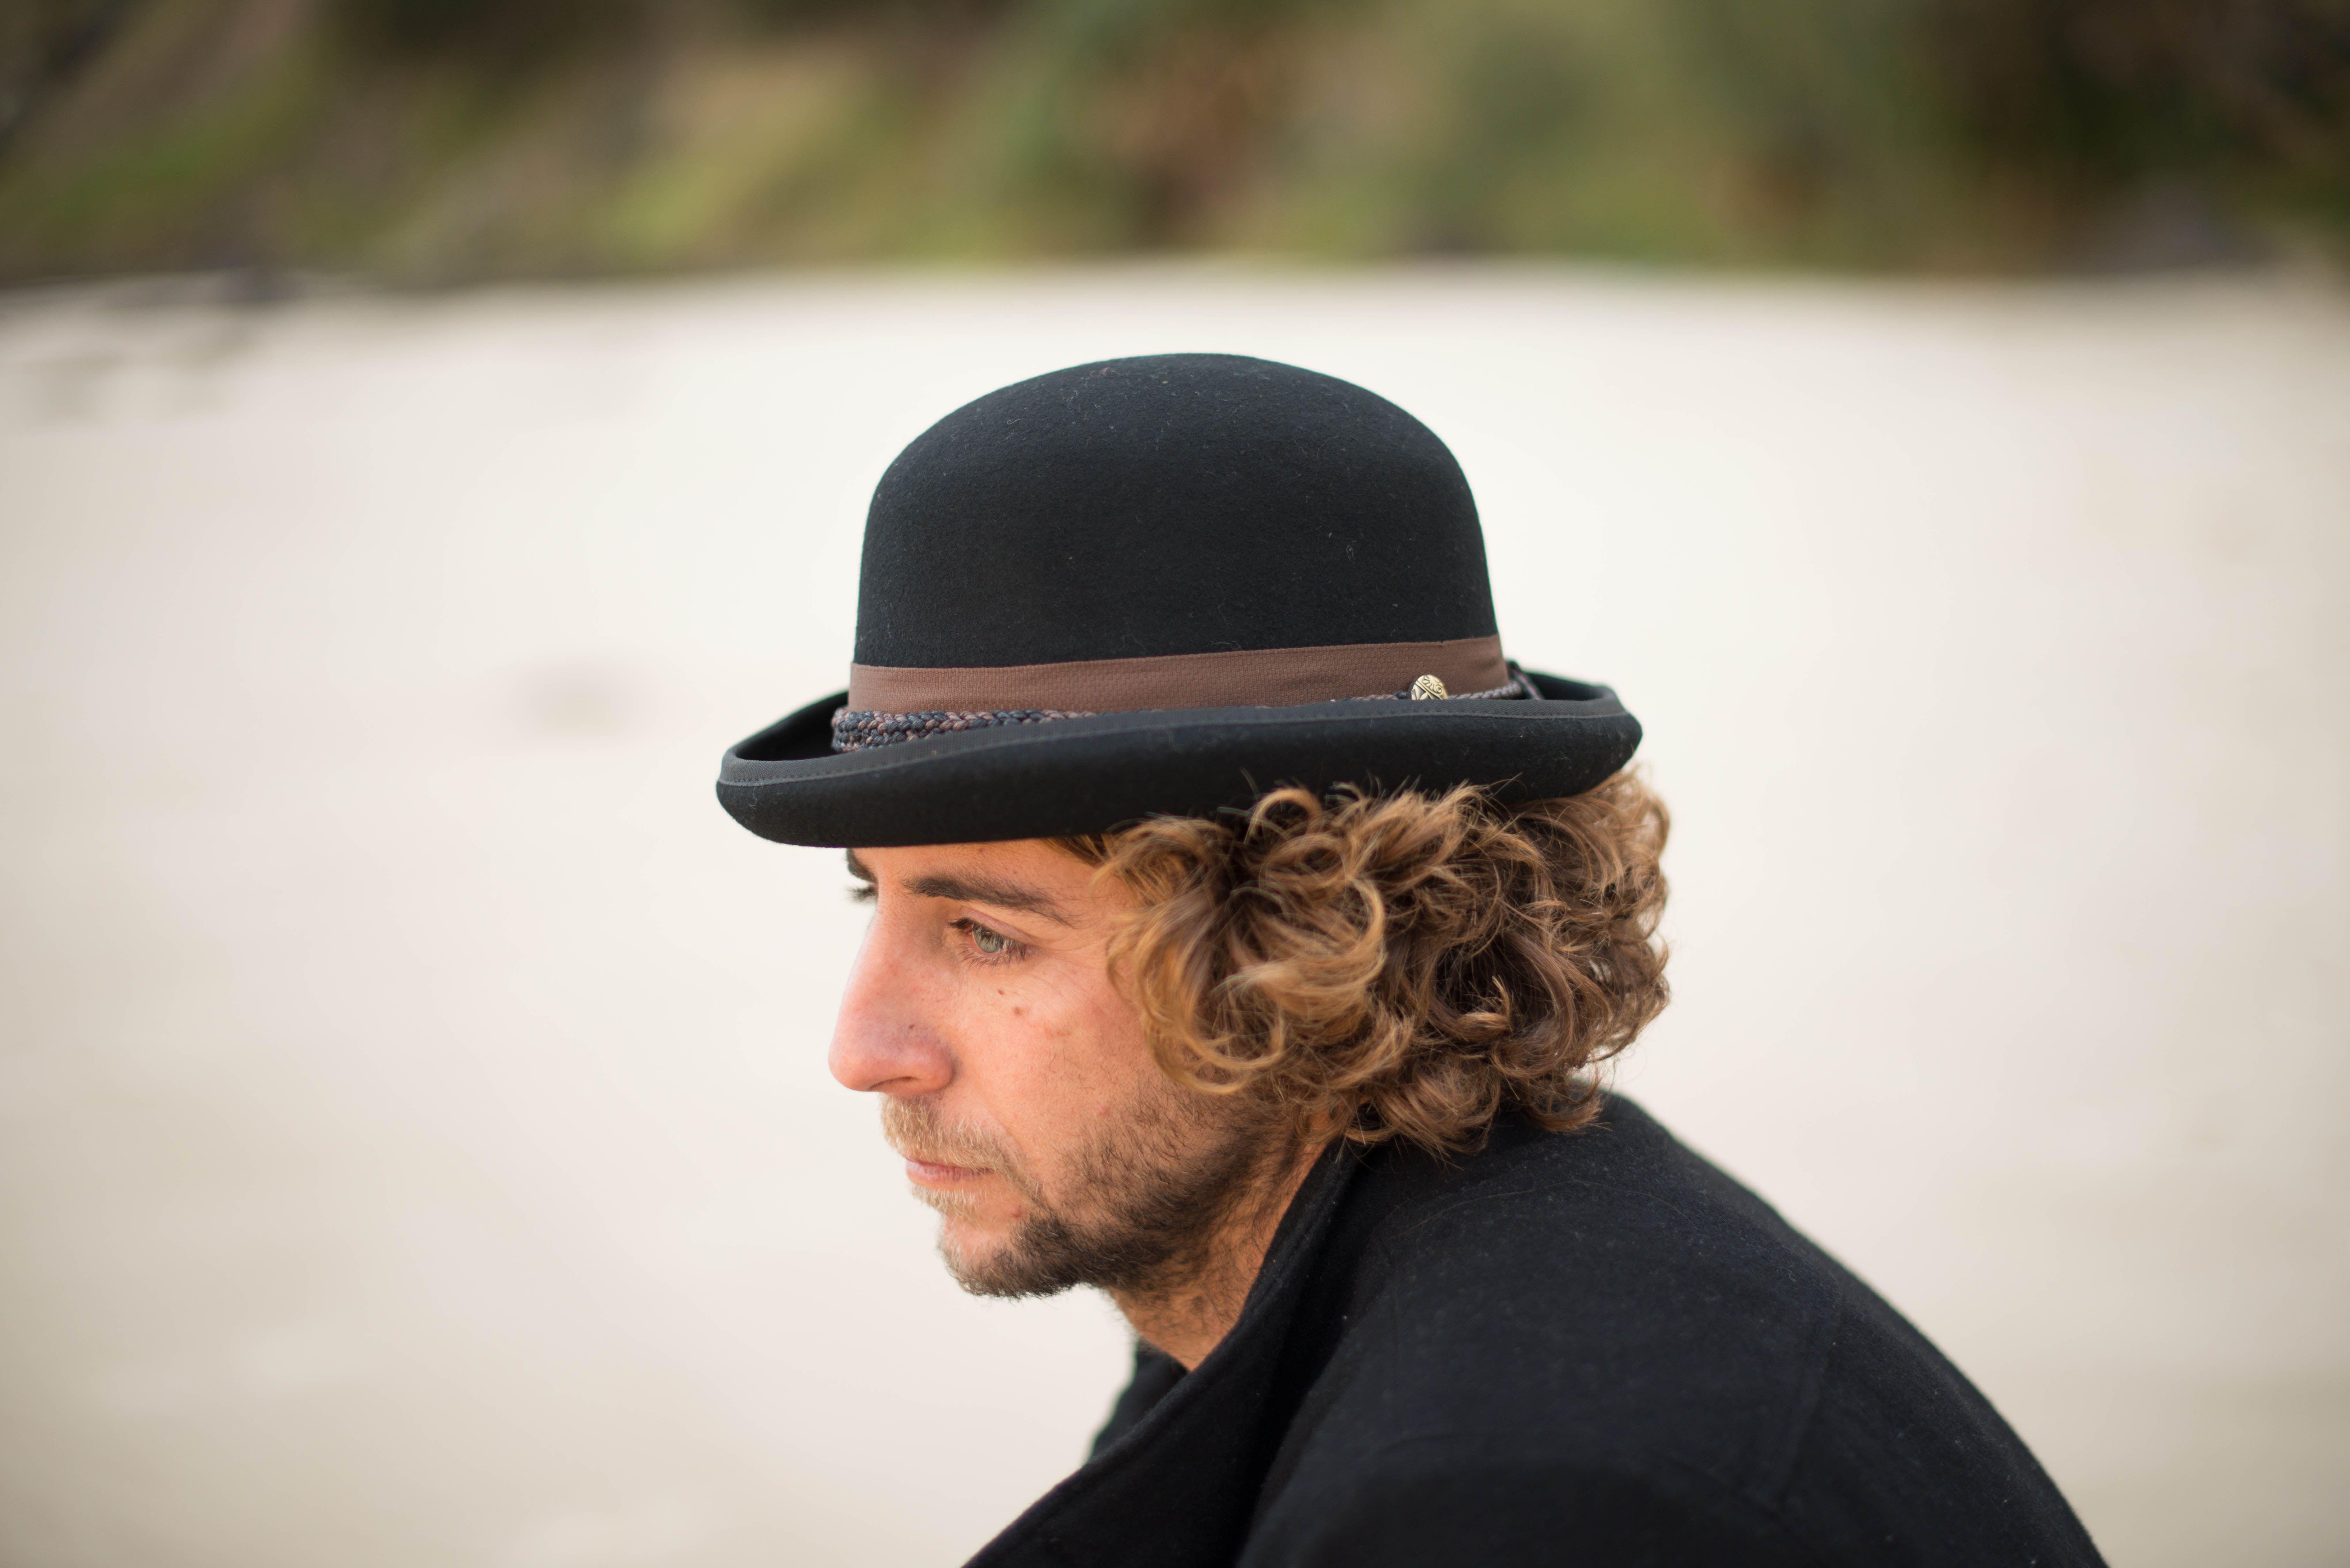 3c891f3b348297 Handmade Australian Wool Bowler hat has 5